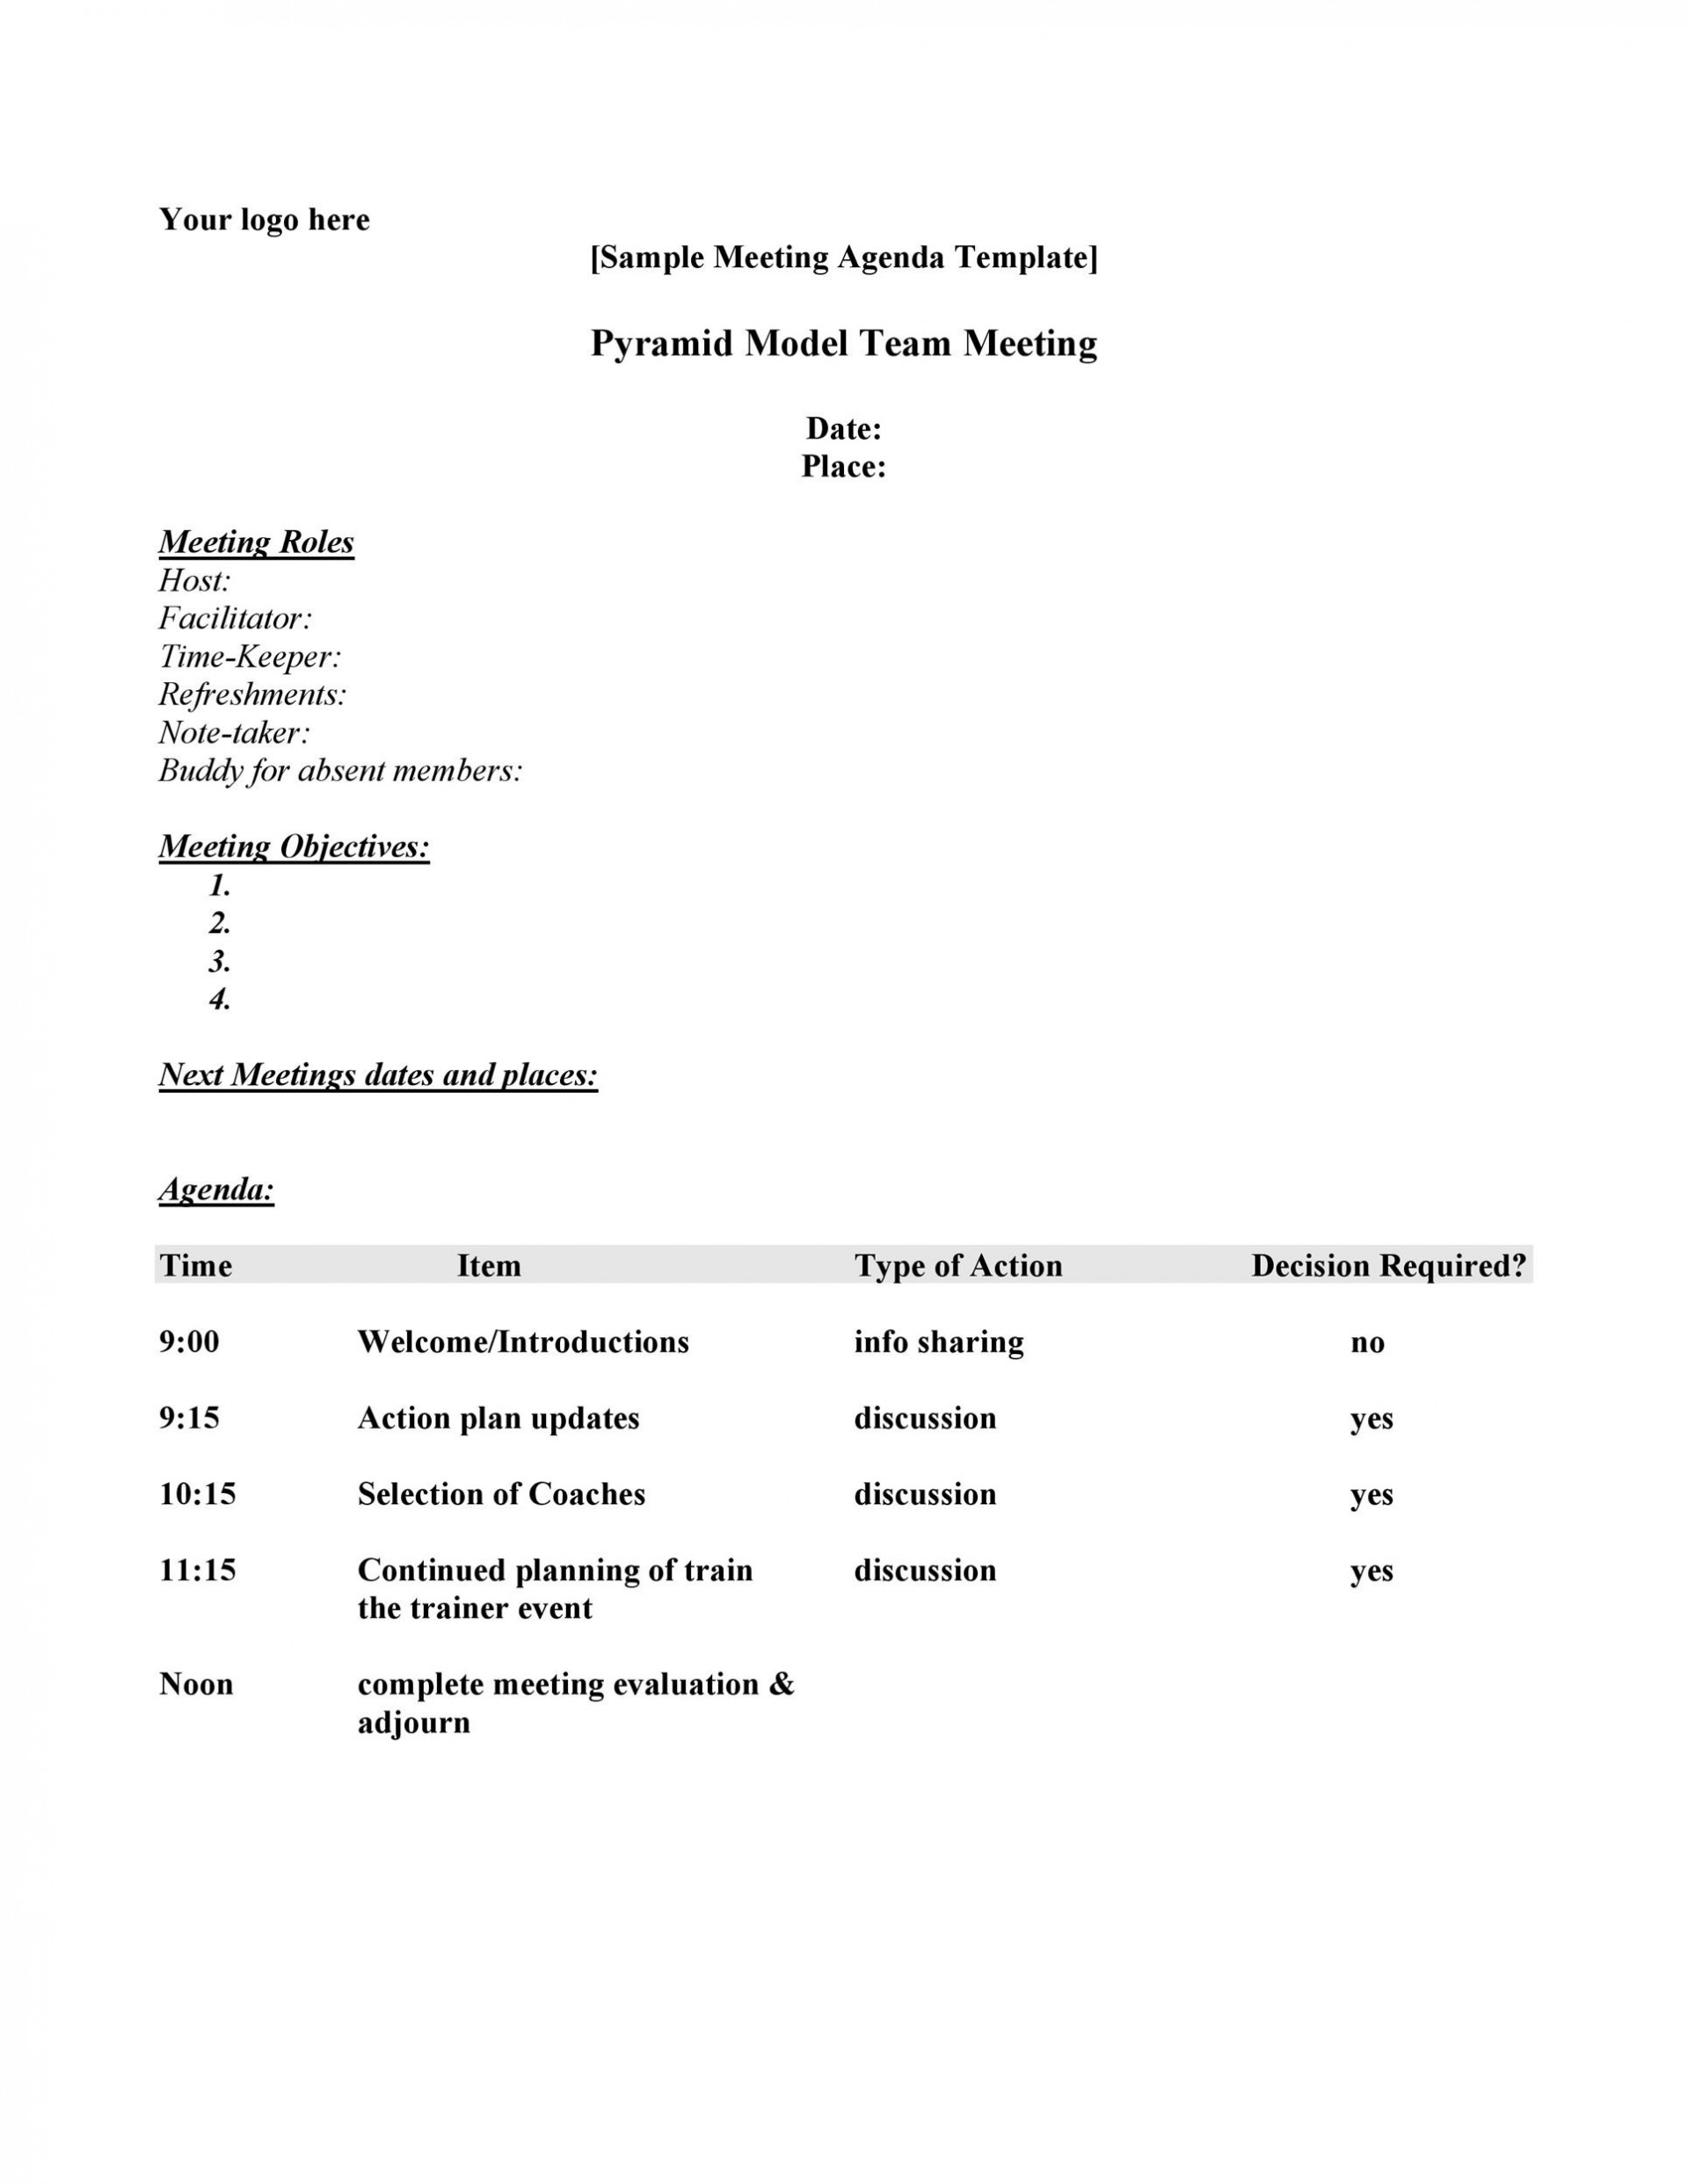 005 Fascinating Staff Meeting Agenda Template Photo  Example Pdf Sample Format1920